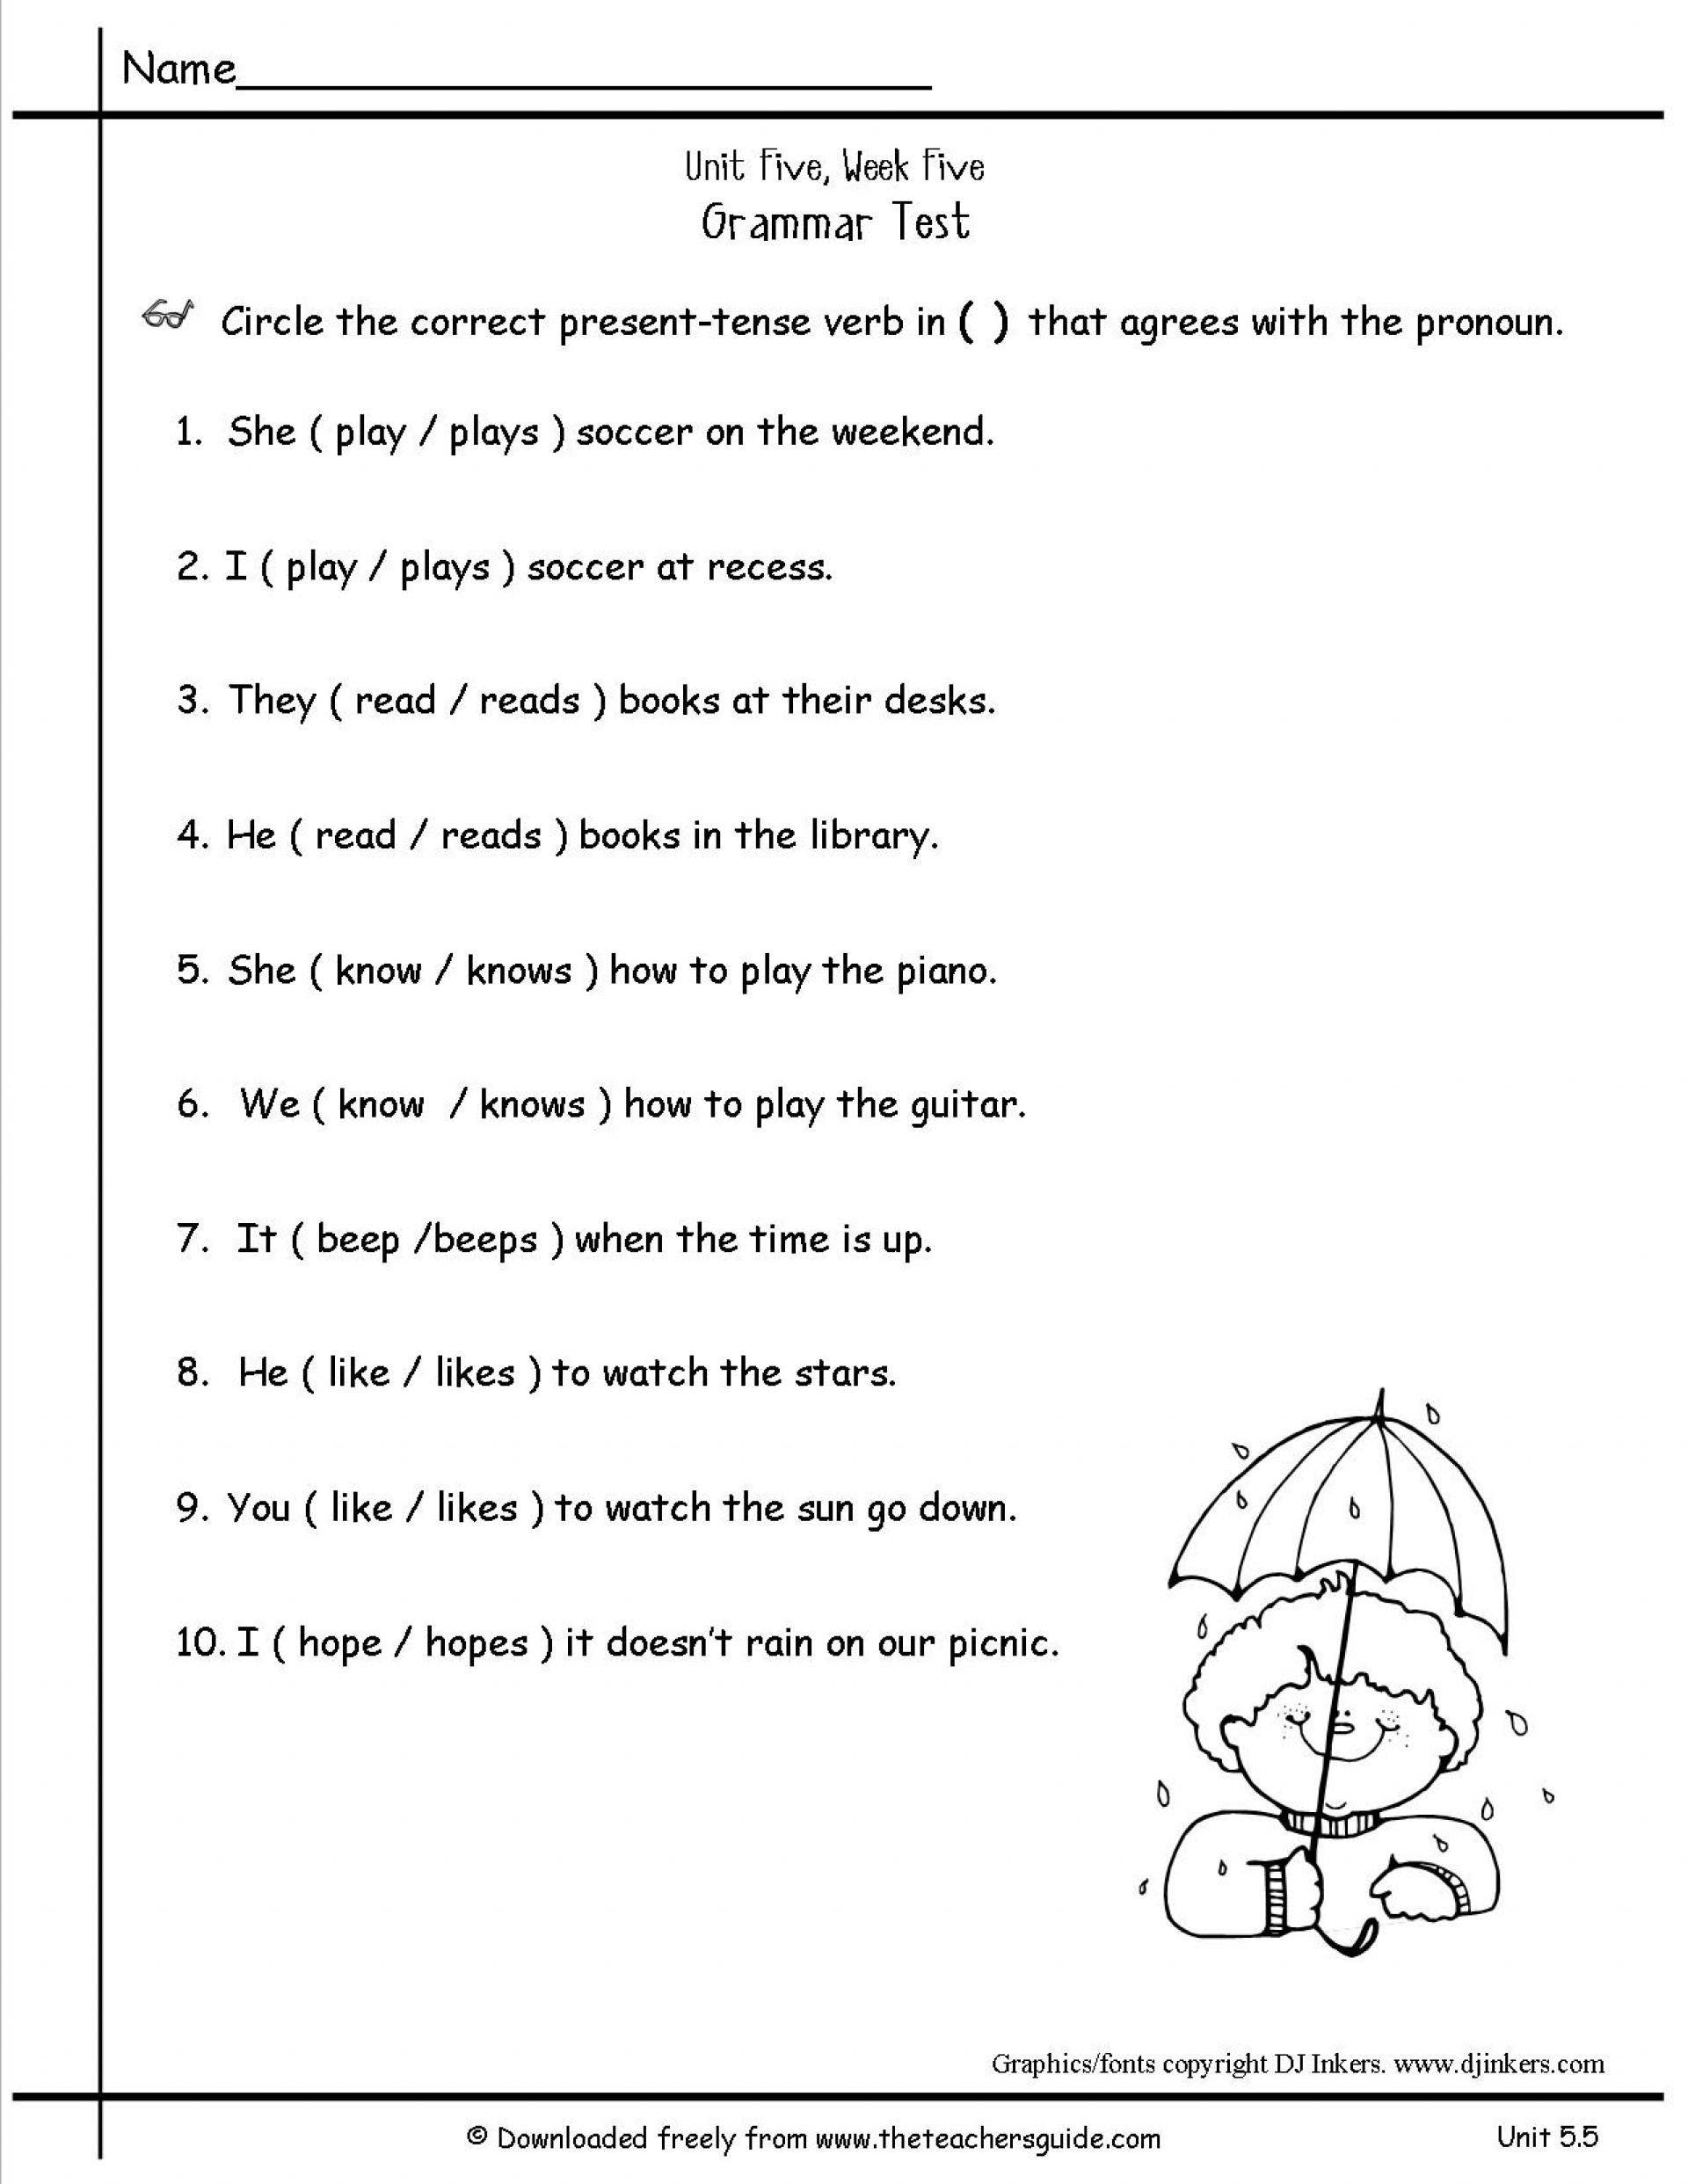 Pronoun Worksheets 2Nd Grade For Print | Worksheet News - Free Printable Pronoun Worksheets For 2Nd Grade